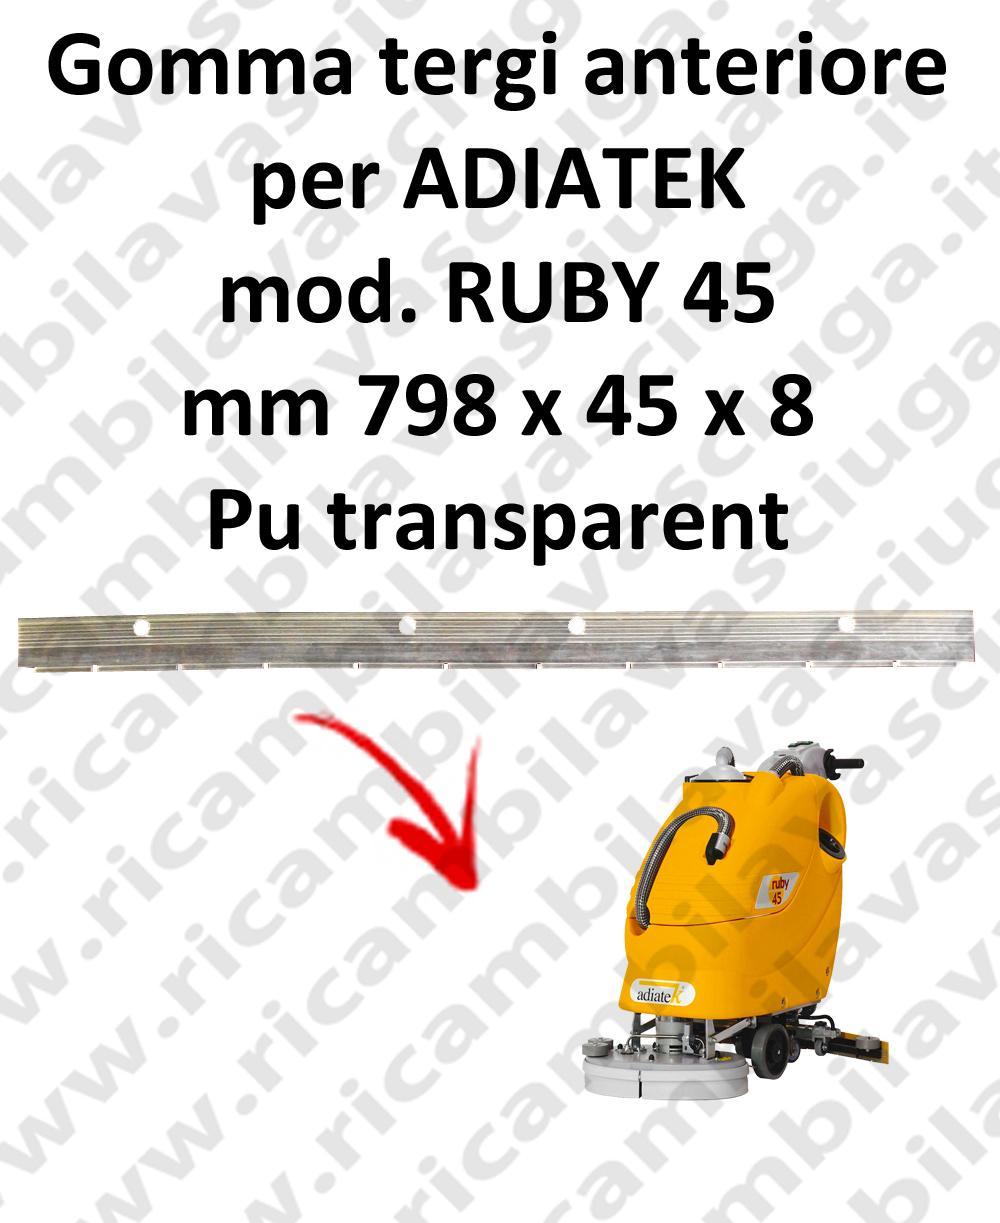 RUBY 45 - GOMMA TERGI anteriore per lavapavimenti ADIATEK